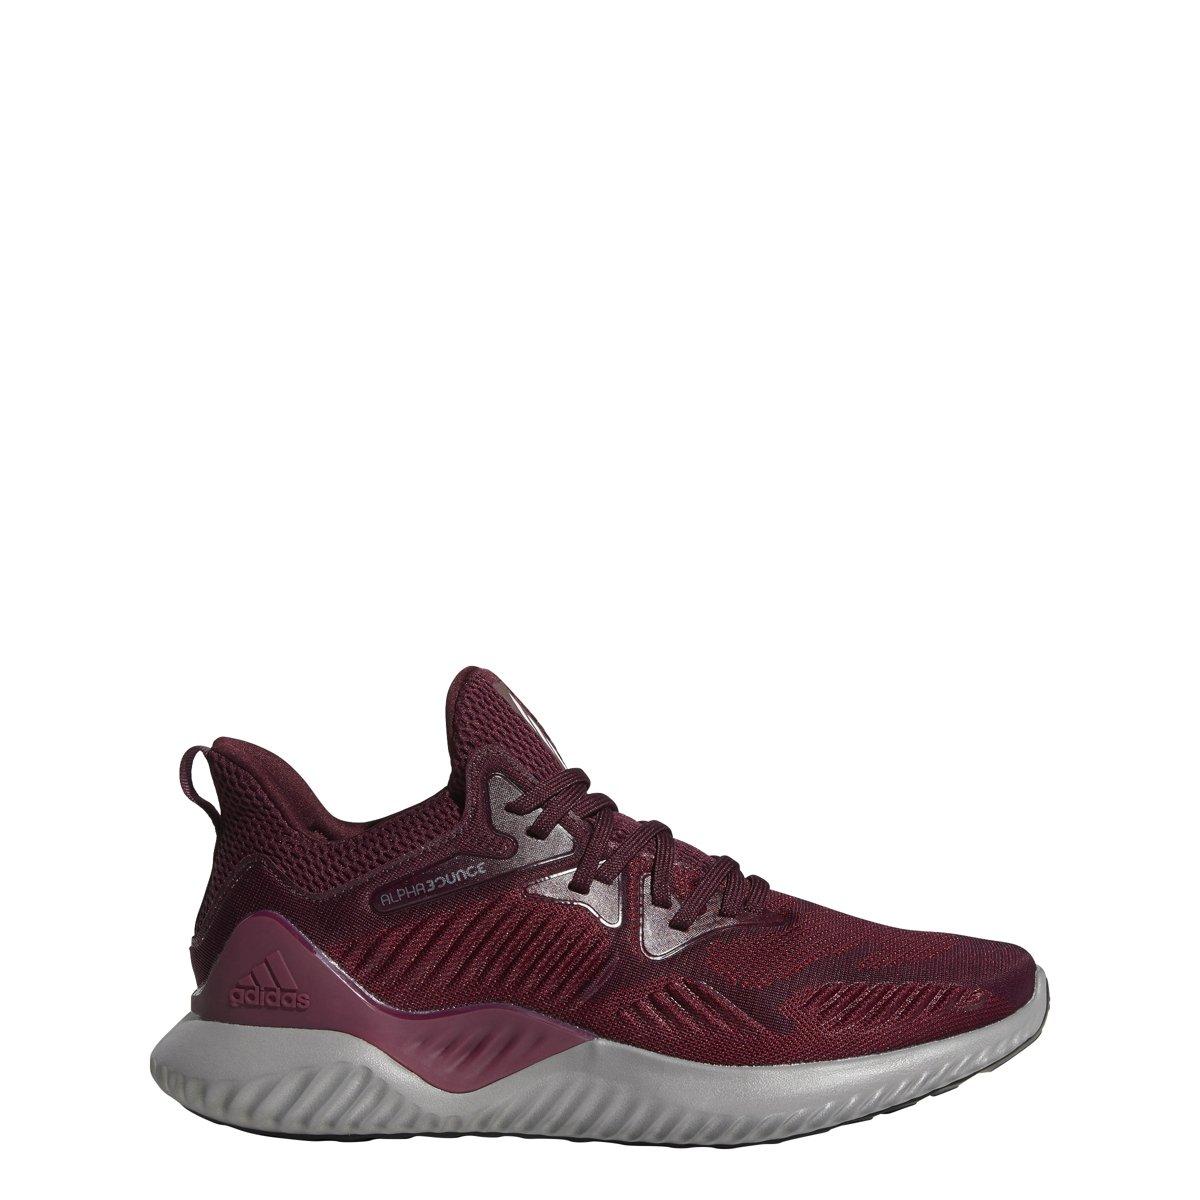 adidas Alphabounce Beyond Team Shoe Men's Running B077XNZRN2 15 D(M) US|Maroon/White/Black